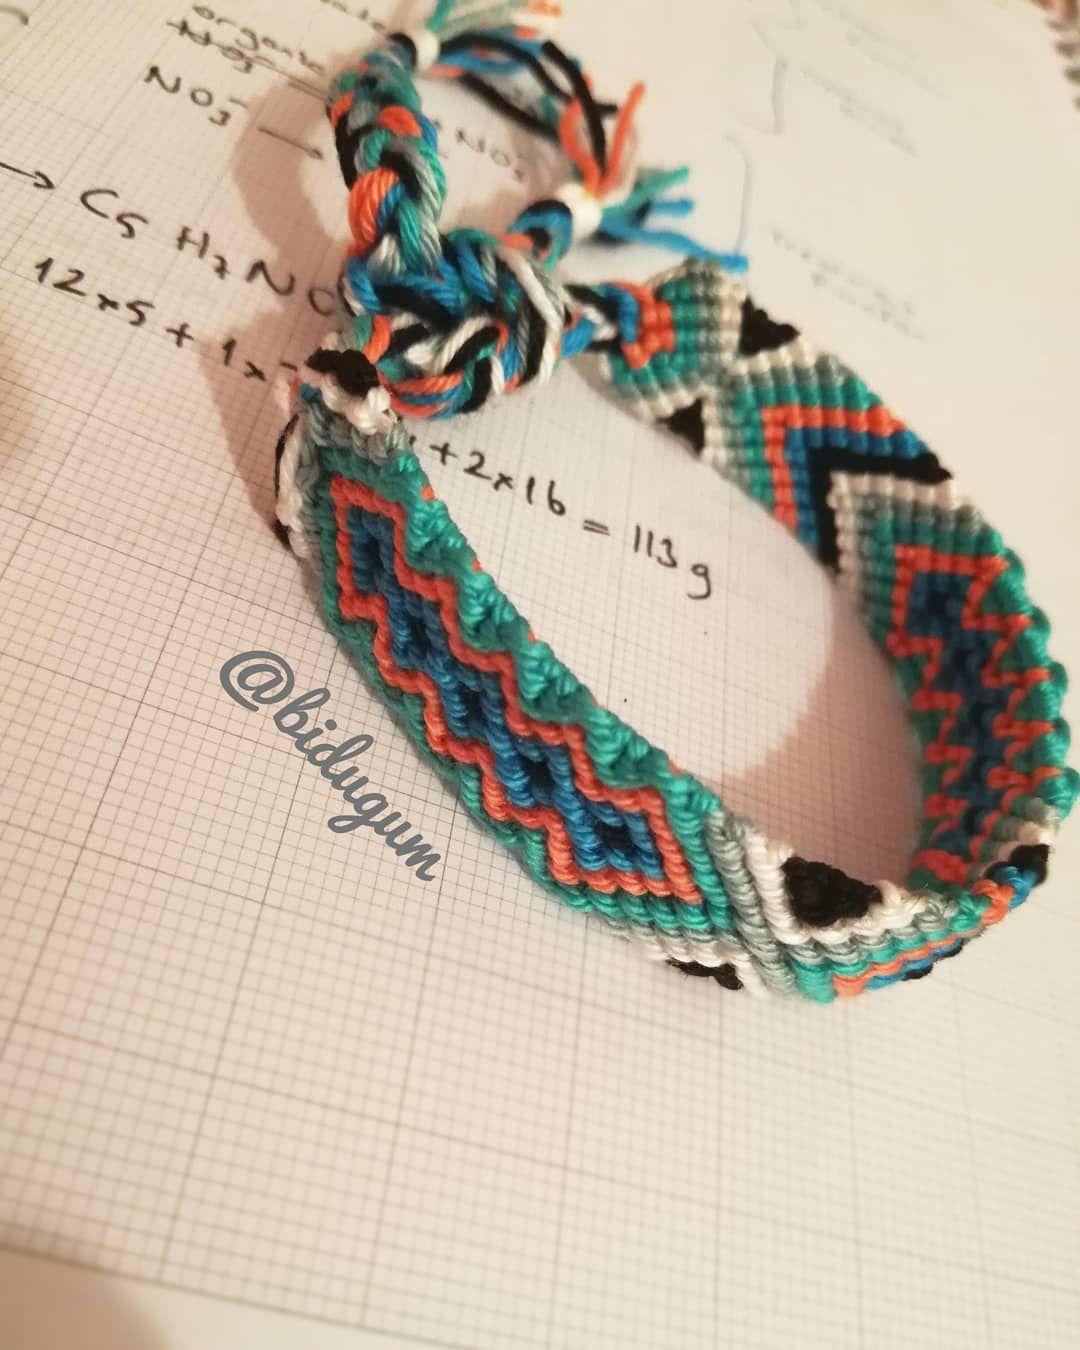 11 Begenme 0 Yorum Instagram Da Bidugum Bidugum Heryerde Sen Dizisindeki S Frendship Bracelets Embroidered Friendship Bracelet Friendship Bracelets